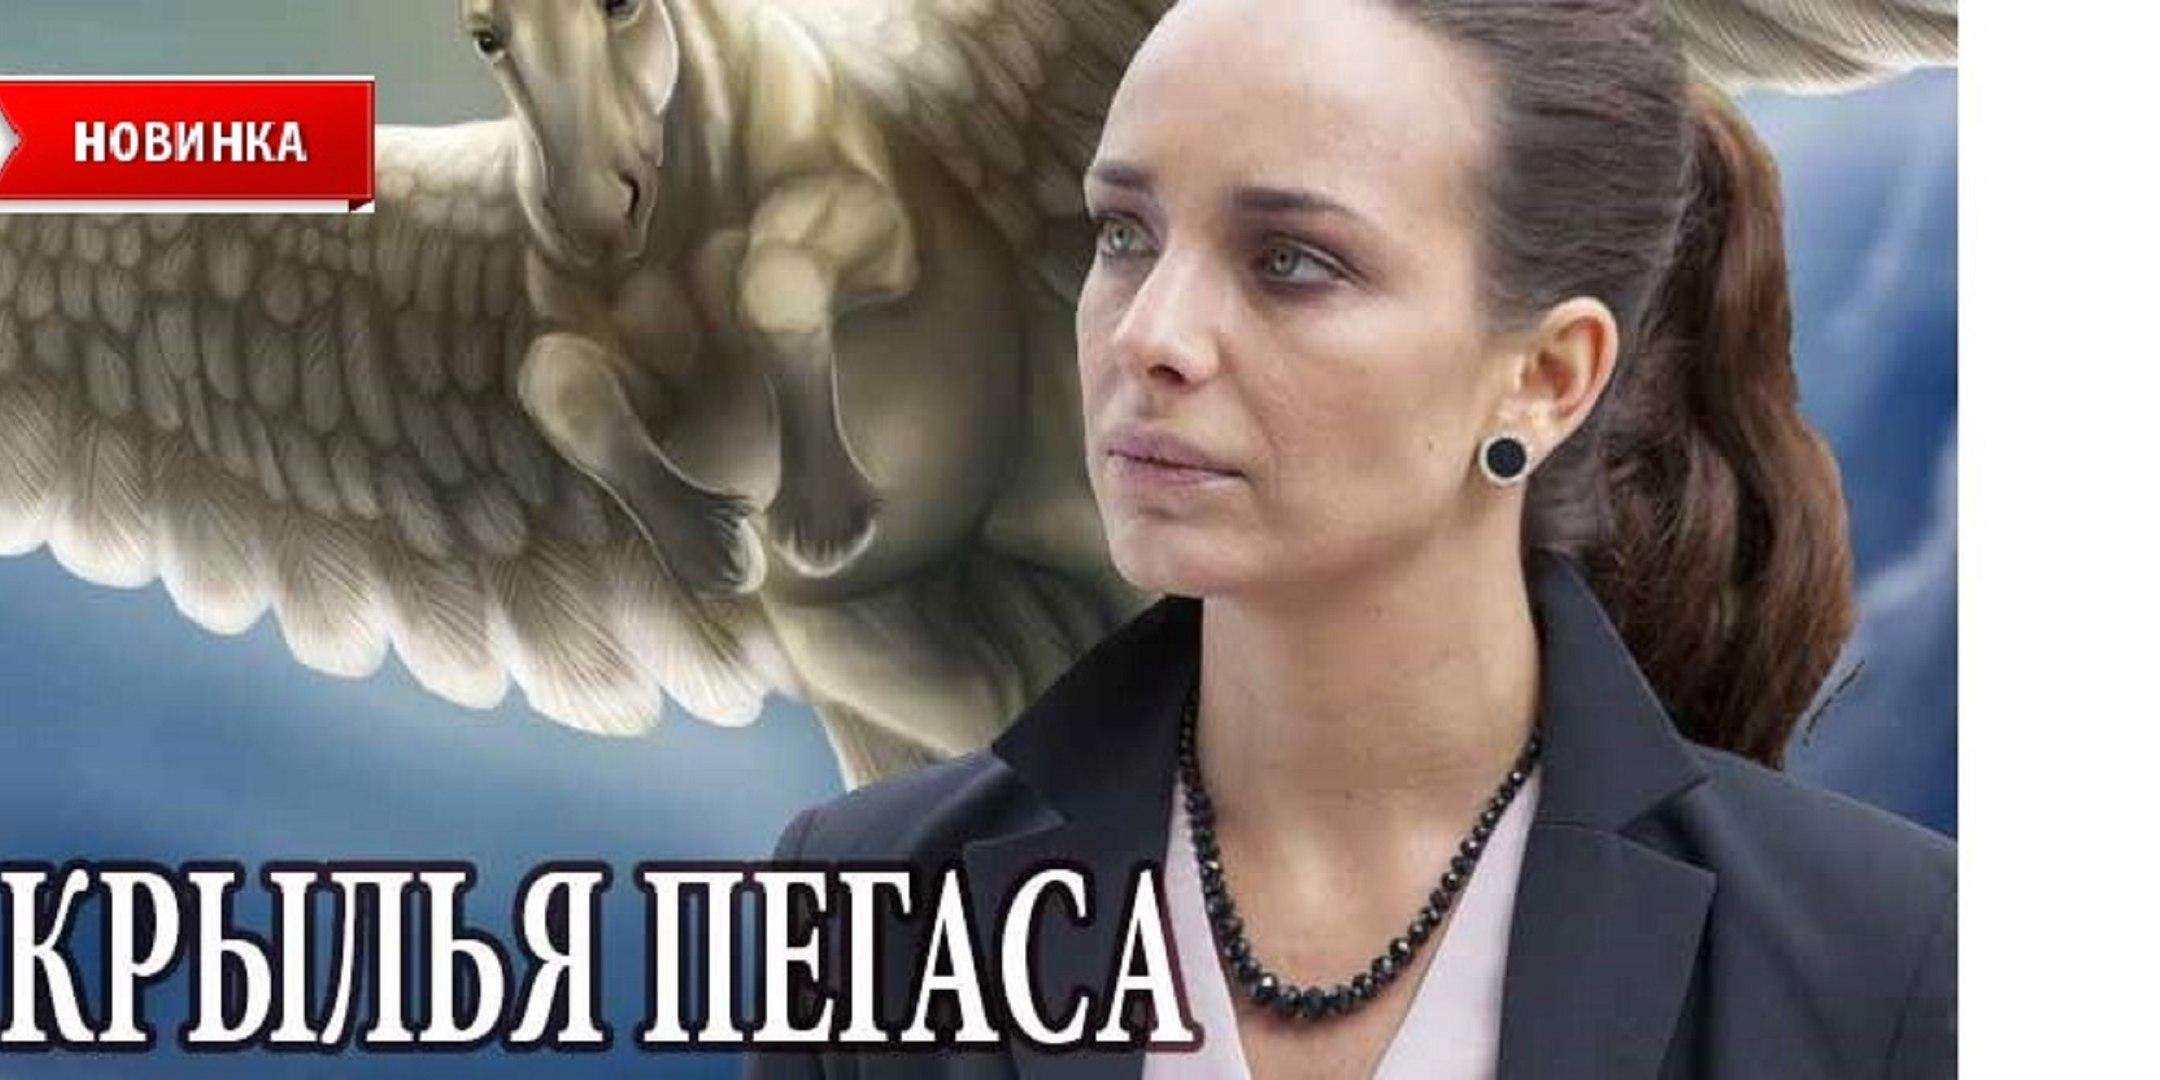 КРЫЛЬЯ ПЕГАСА. Прекрасная Мелодрама 2018 HD! Filmi Melodrama